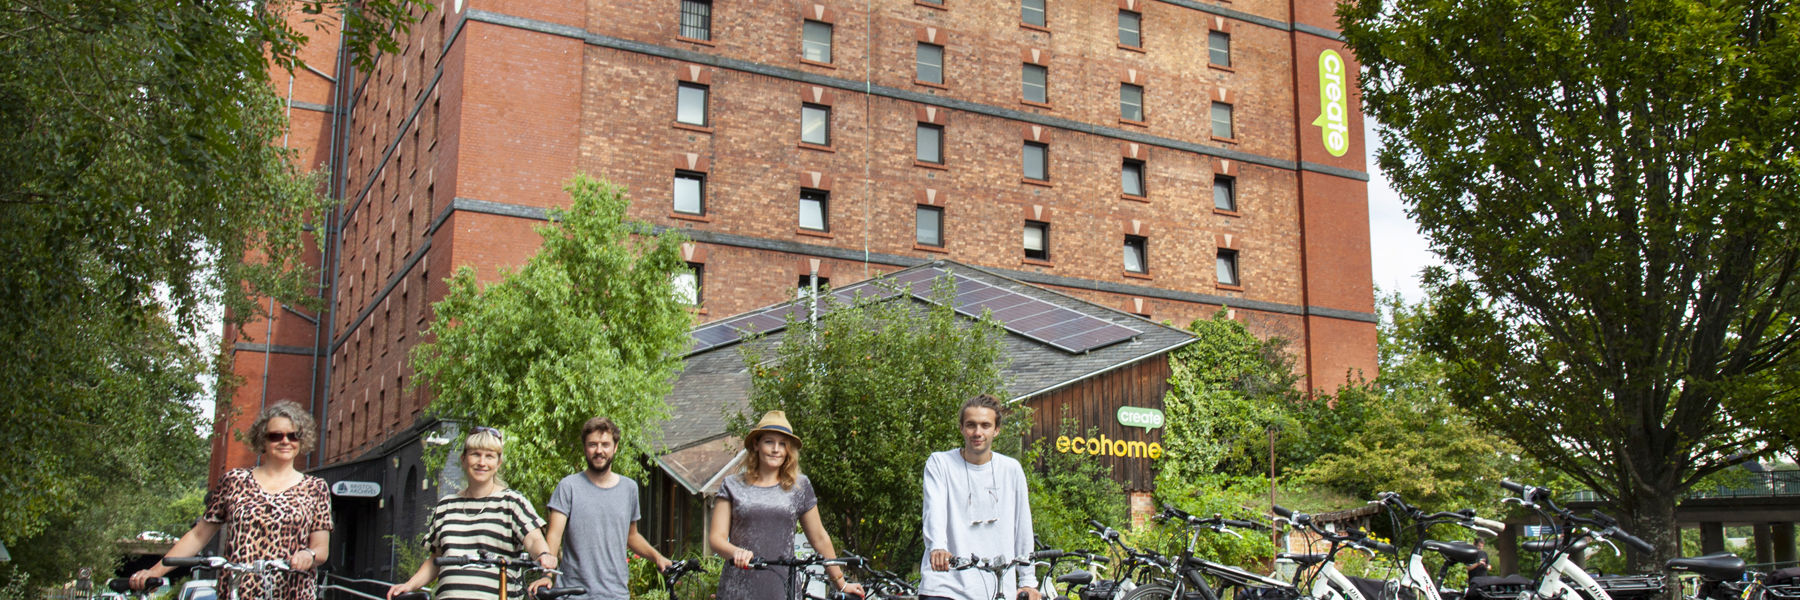 Loan bike scheme promotional photo outside Create Centre Bristol